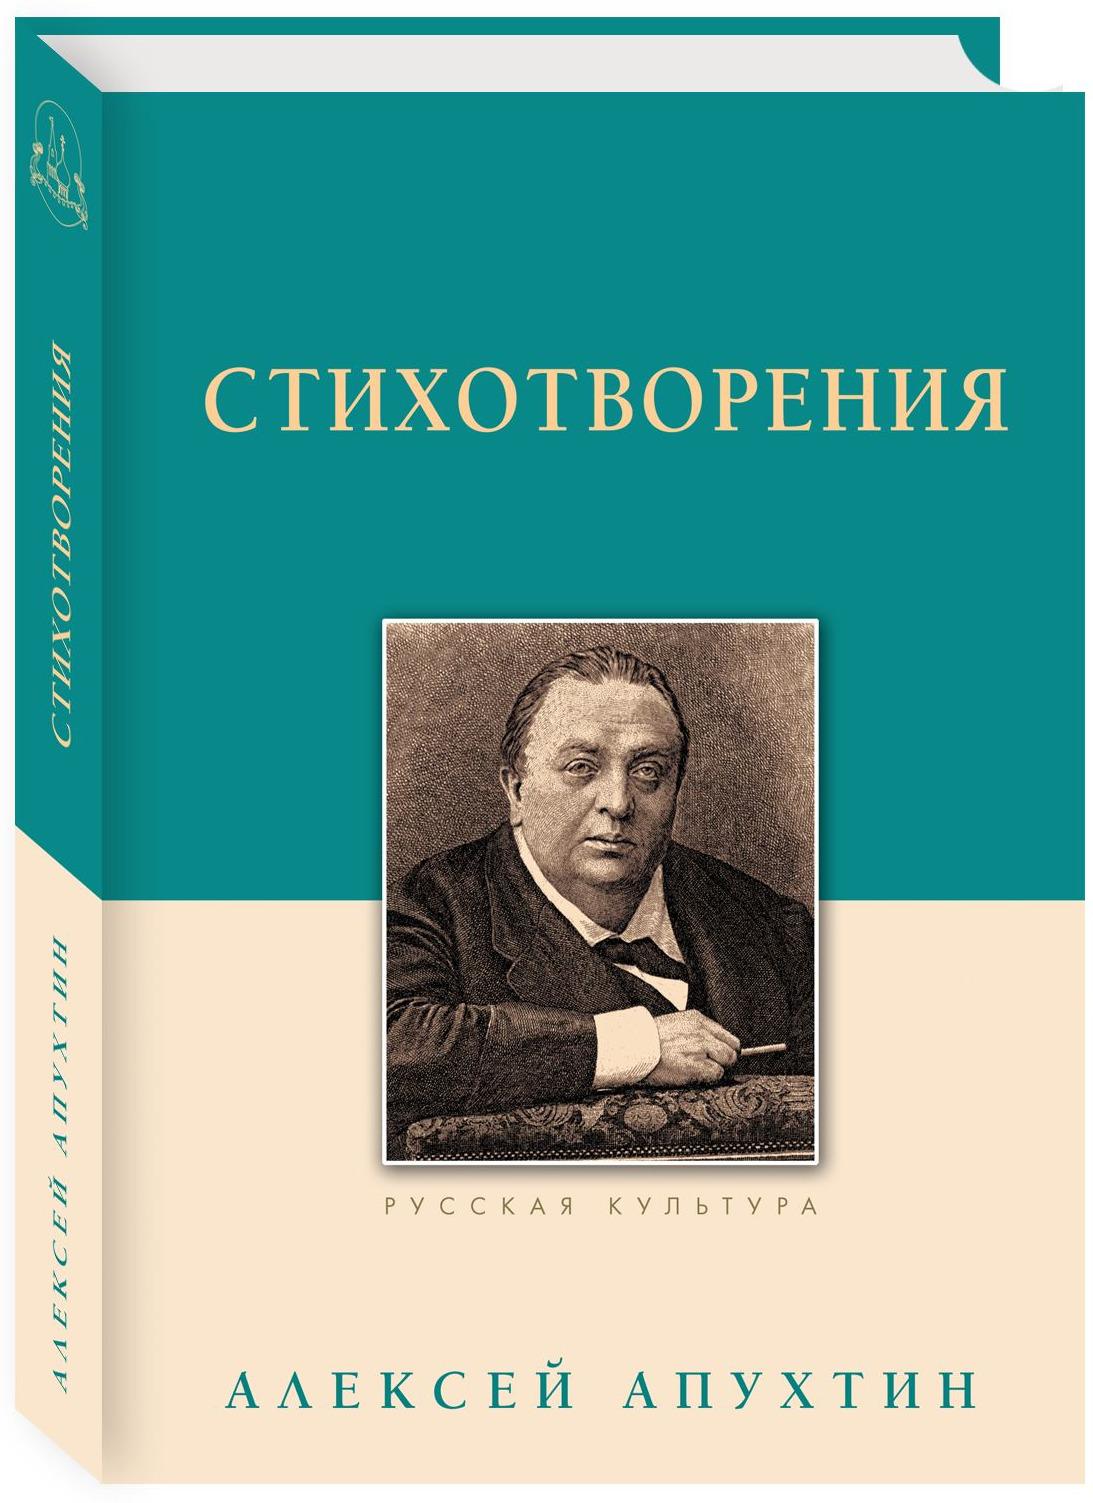 Алексей Апухтин Алексей Апухтин. Стихотворения алексей апухтин избранное